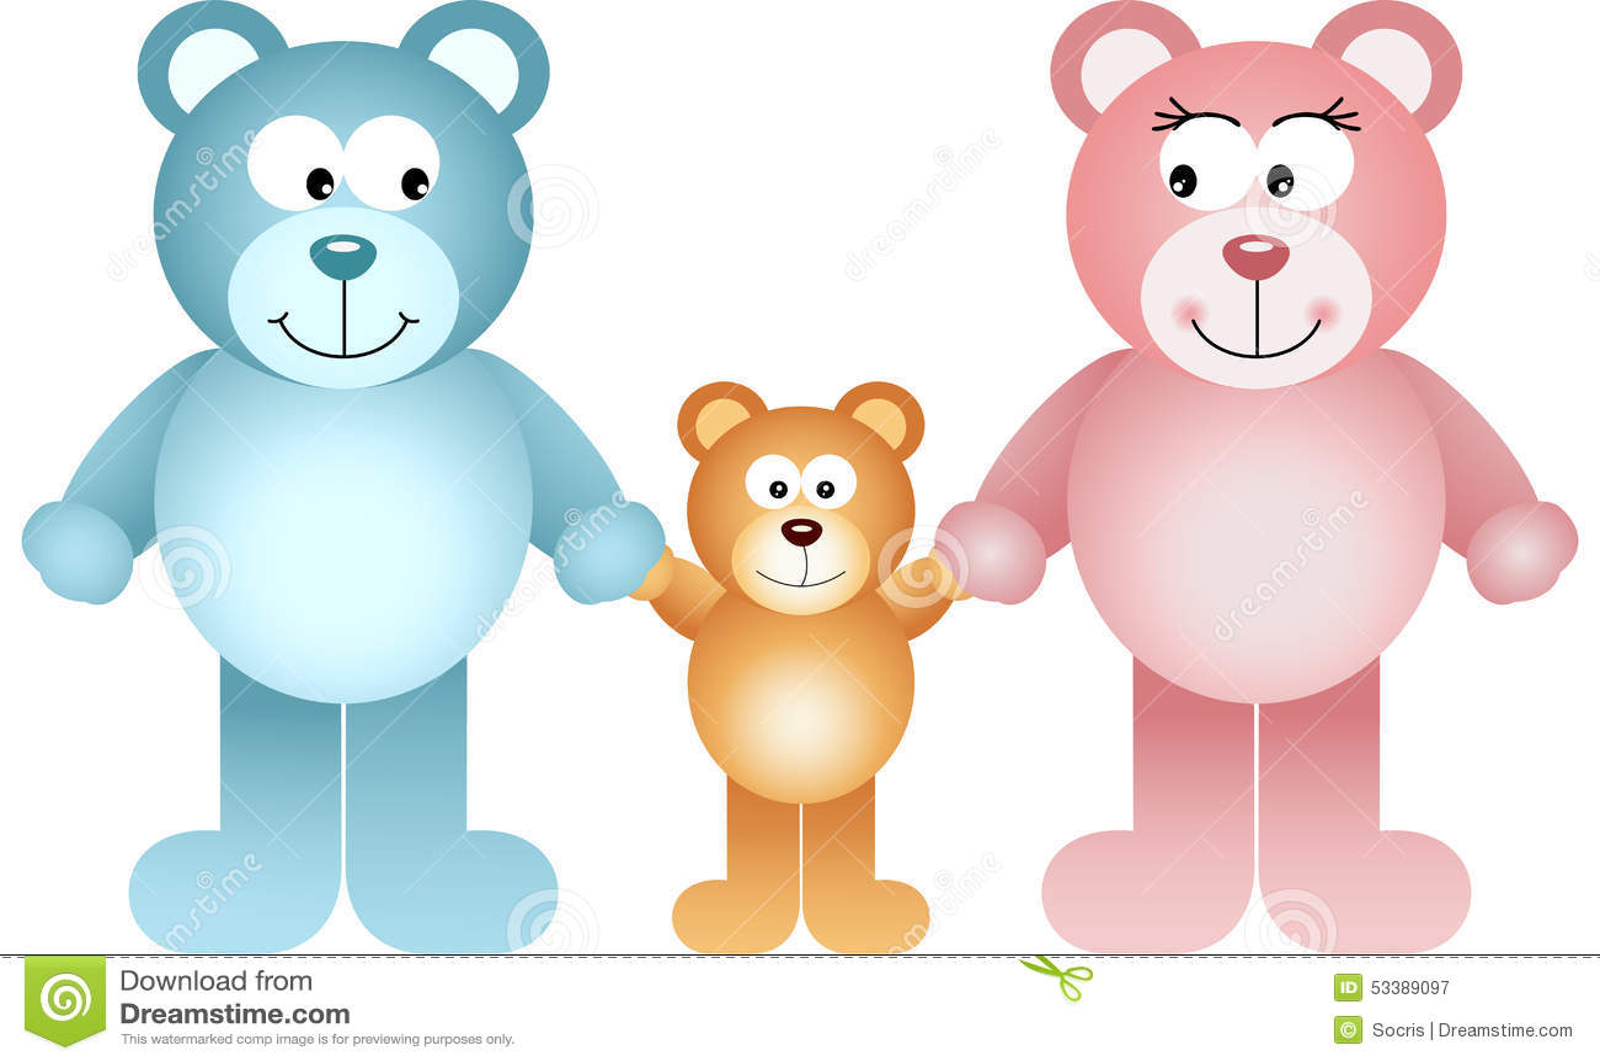 Bear Family Stock Illustrations 8 790 Bear Family Stock Illustrations Vectors Clipart Dreamstime